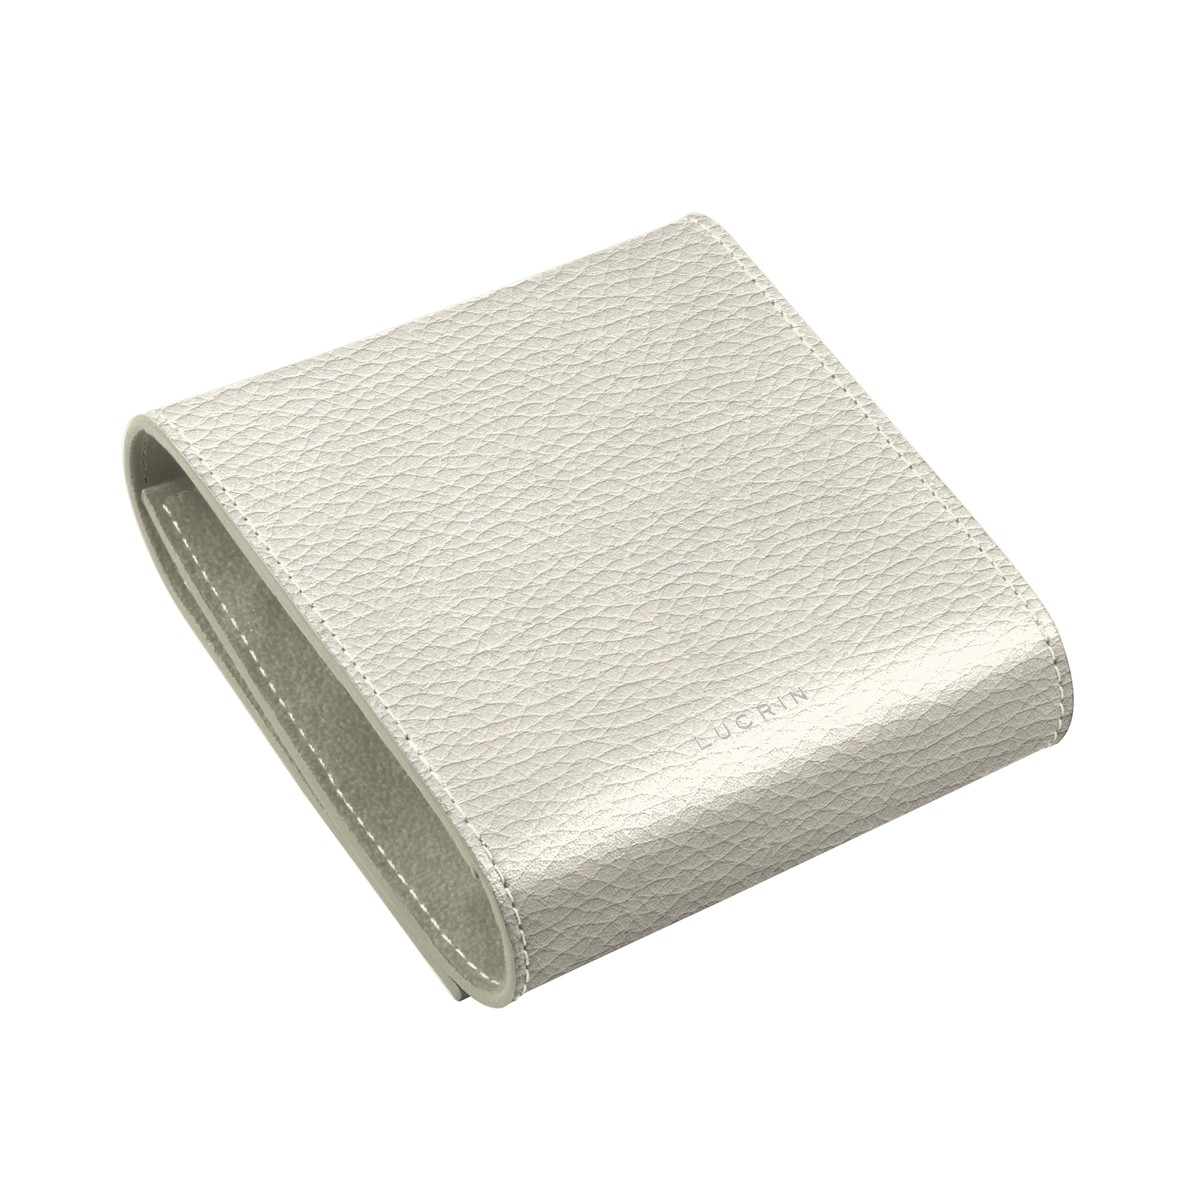 Luxury cufflinks box